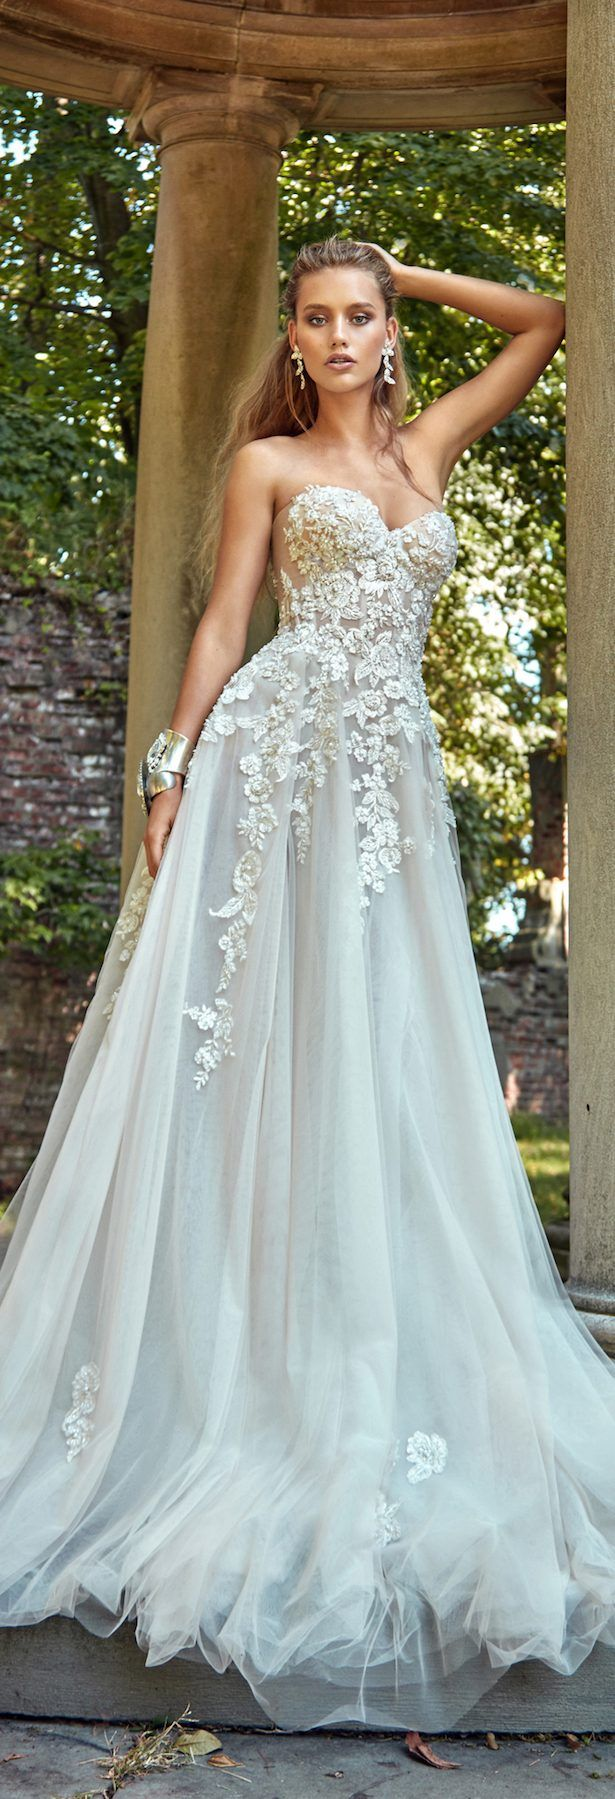 mary j style dresses bridesmaid